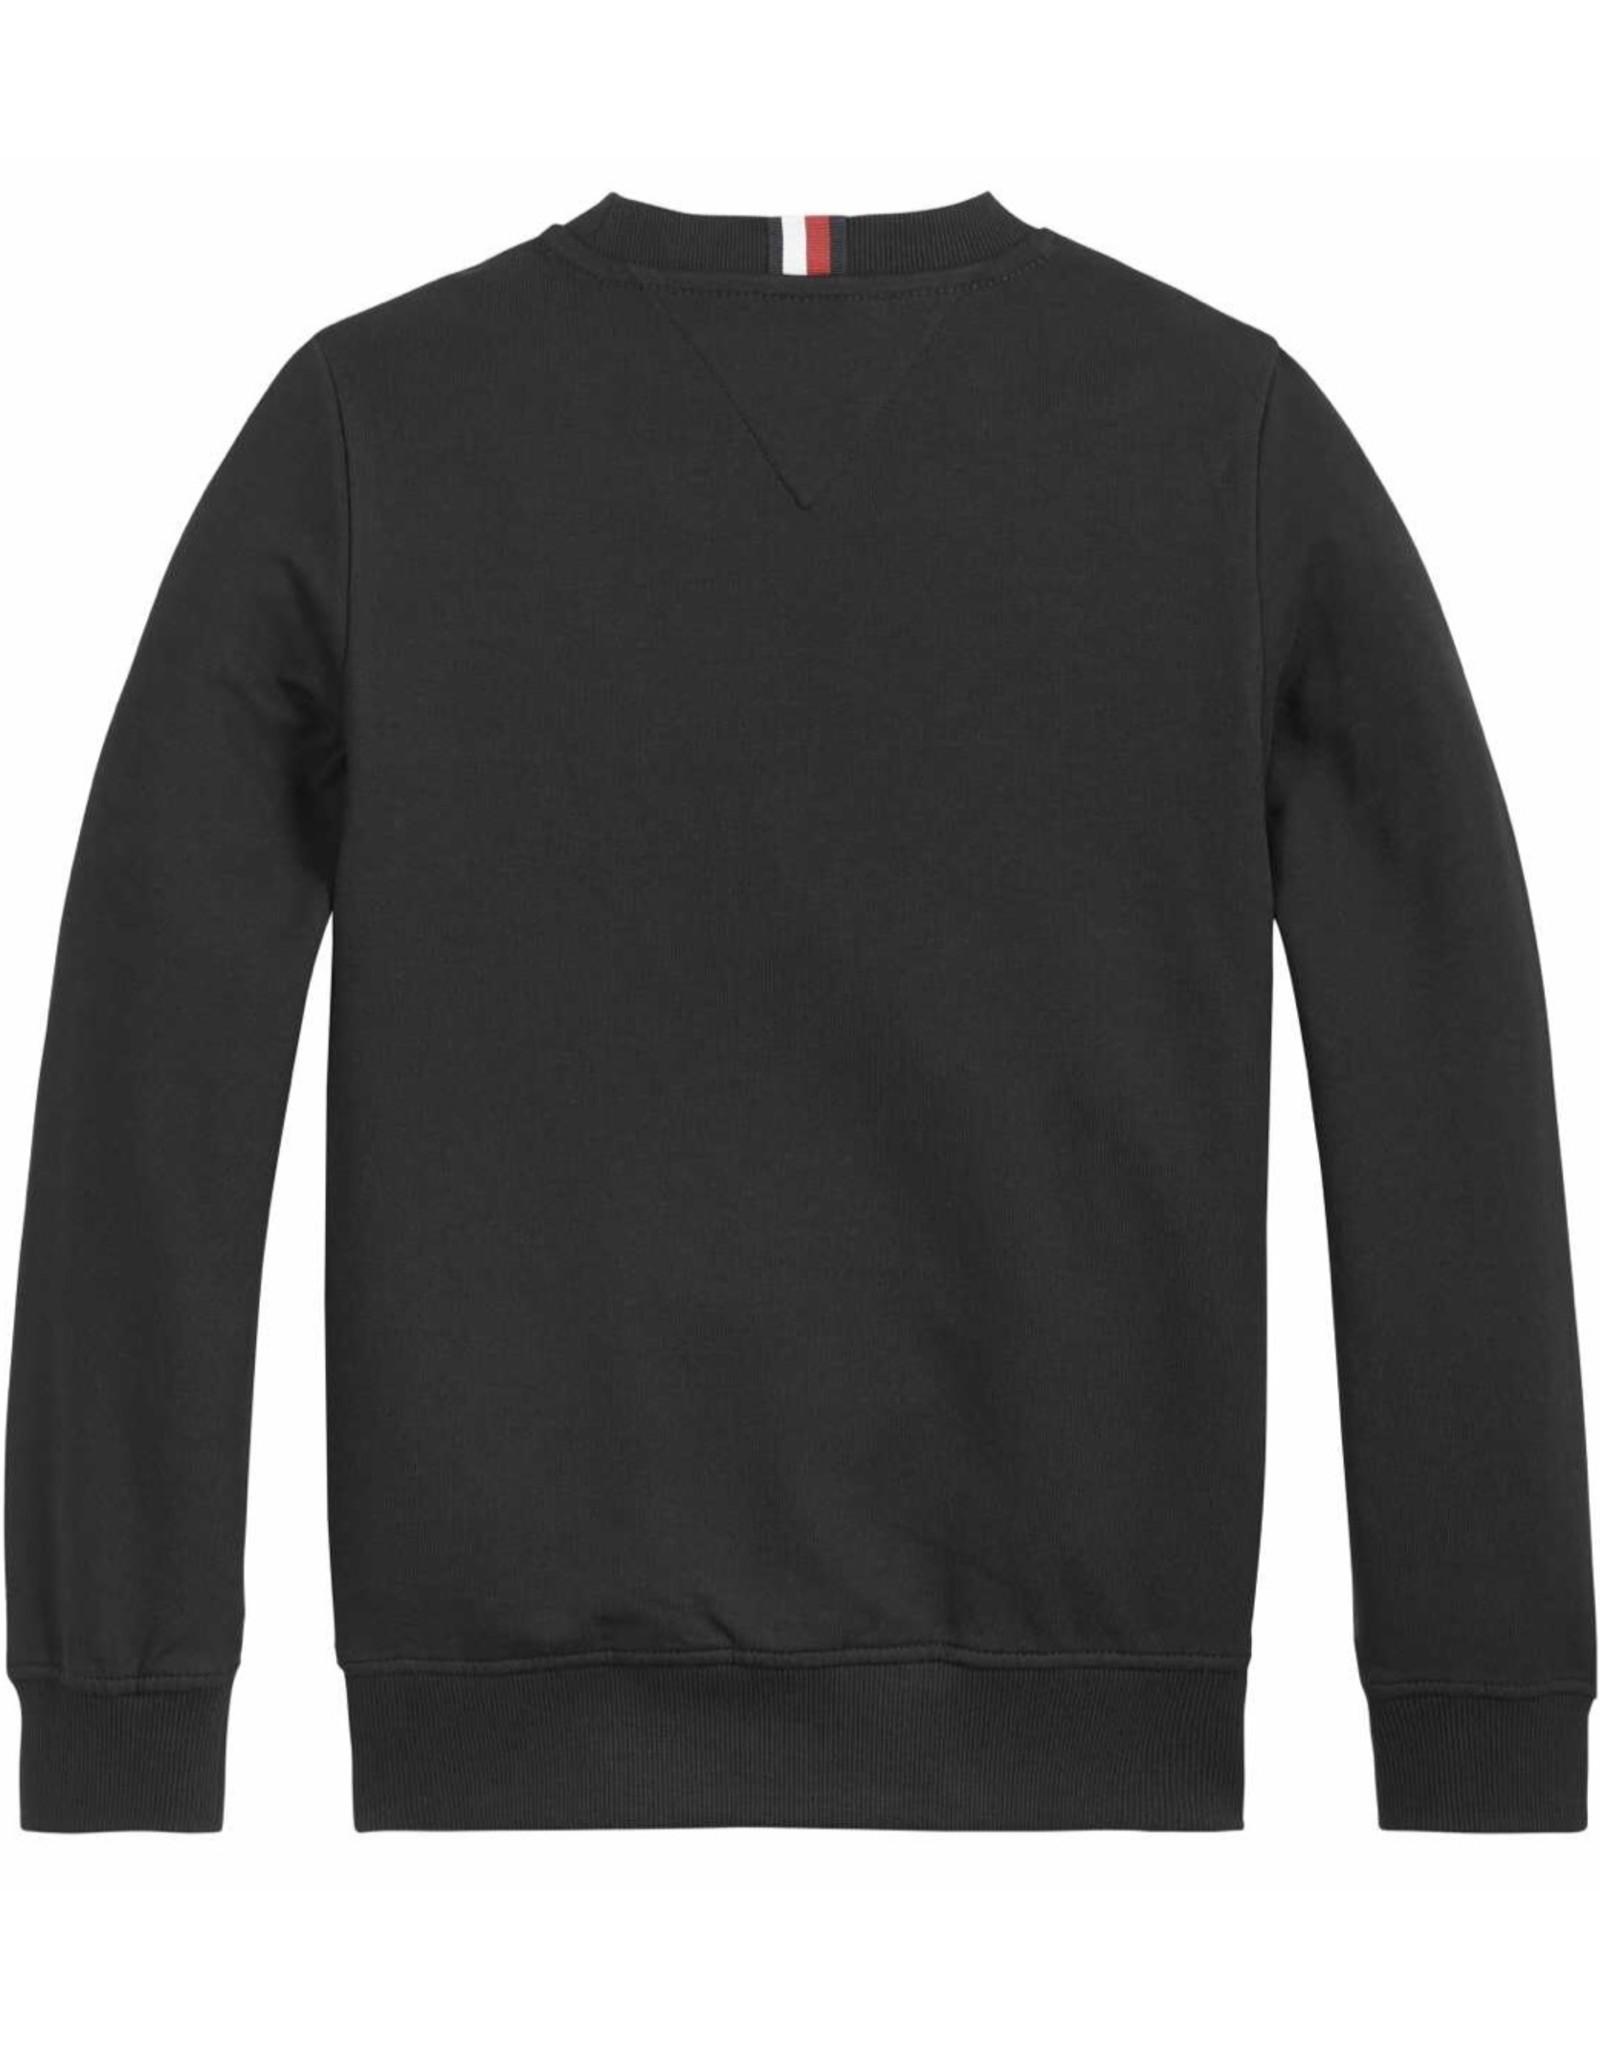 Tommy Hilfiger 6568 Sweater